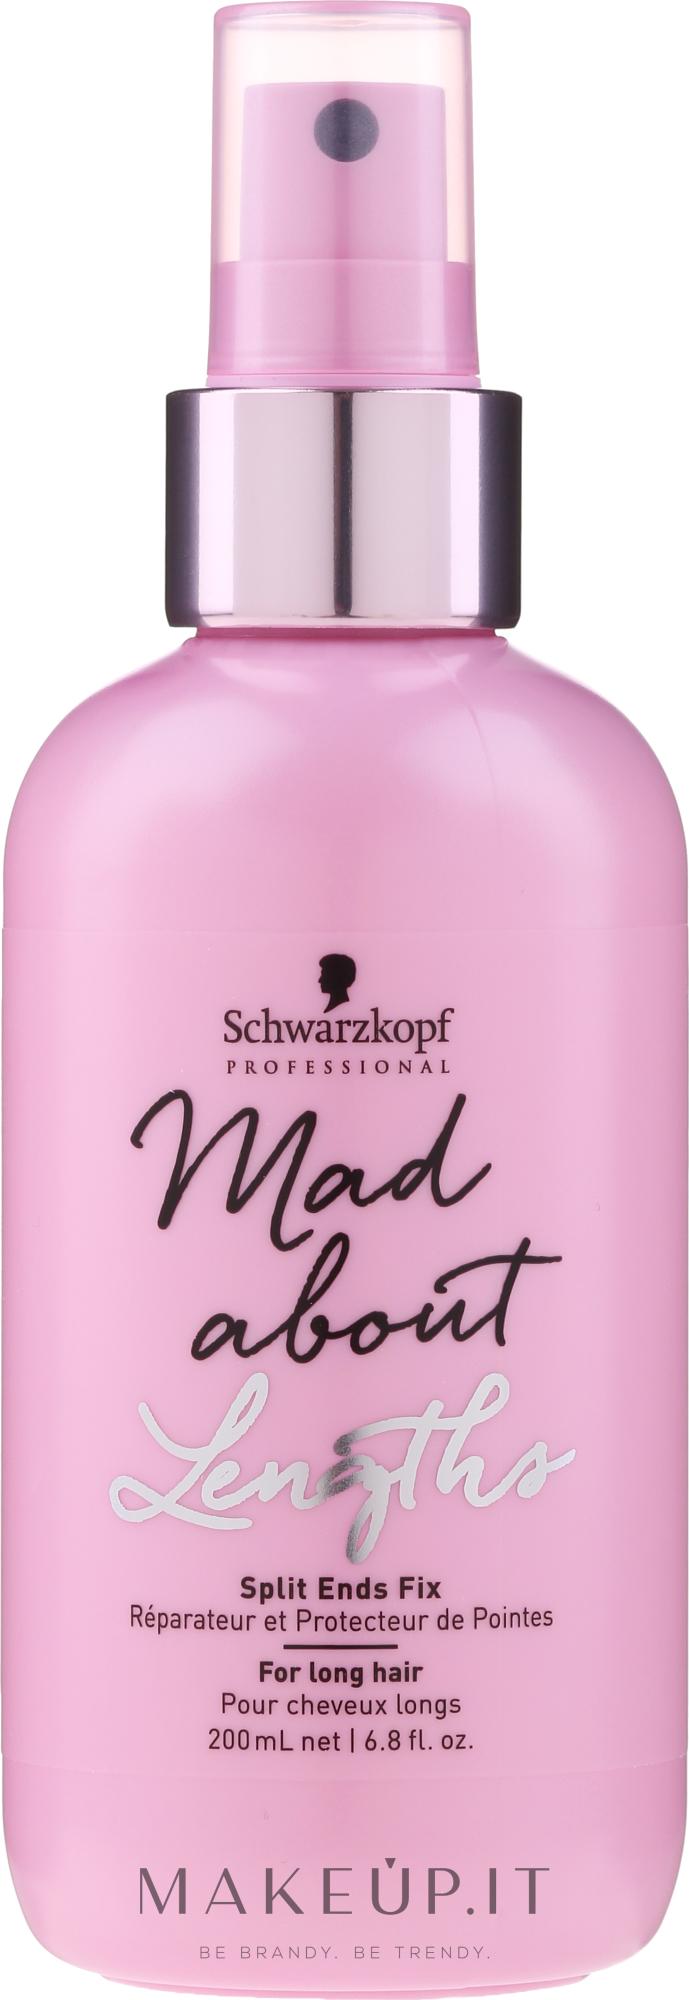 Spray per punte secche e doppie punte - Schwarzkopf Professional Mad About Lengths Split Ends Fix — foto 200 ml